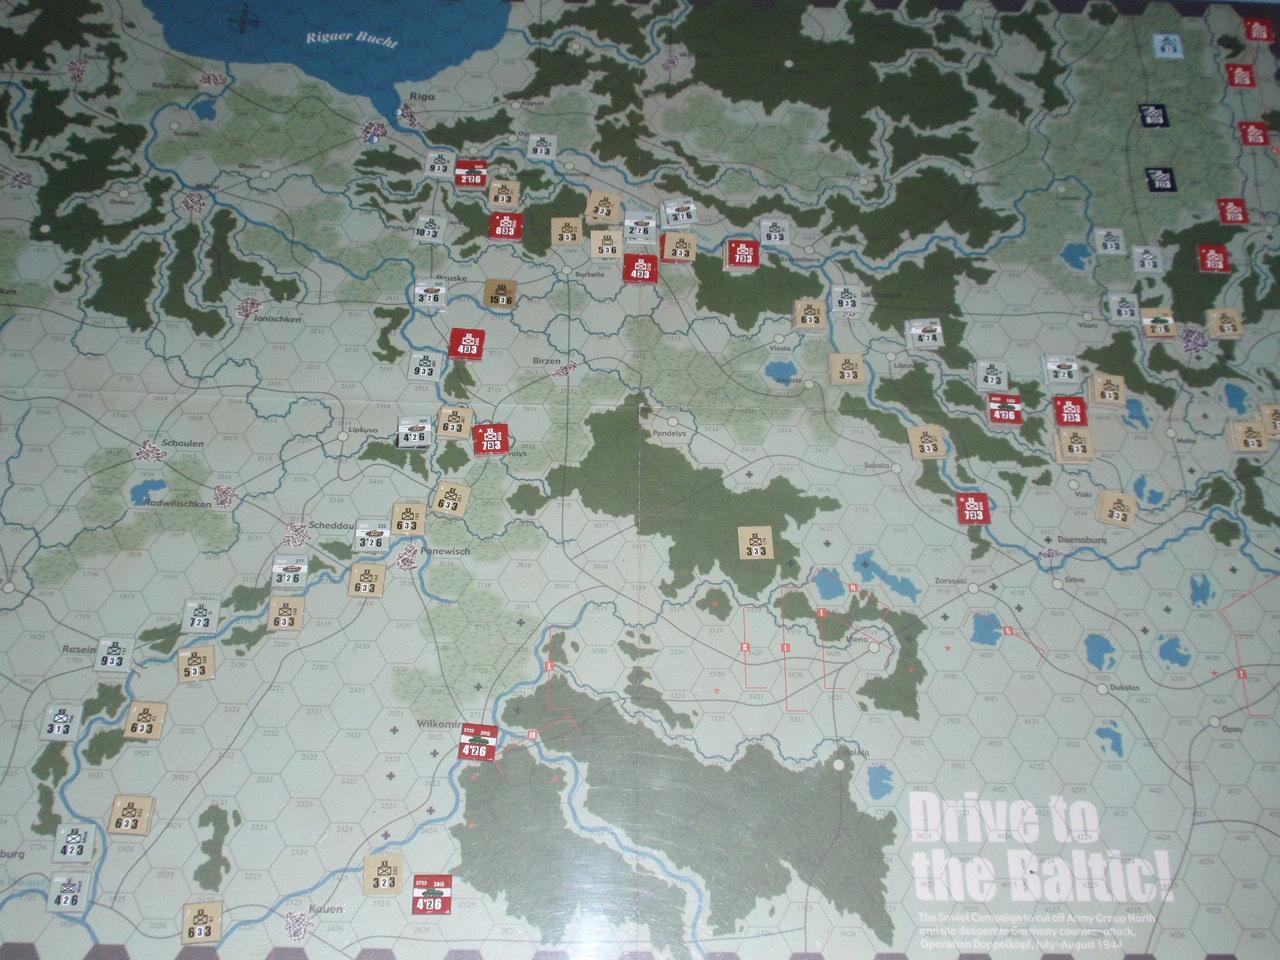 MIH/CMJ「Drive to the Baltic!」をソロプレイ①_b0162202_10334149.jpg